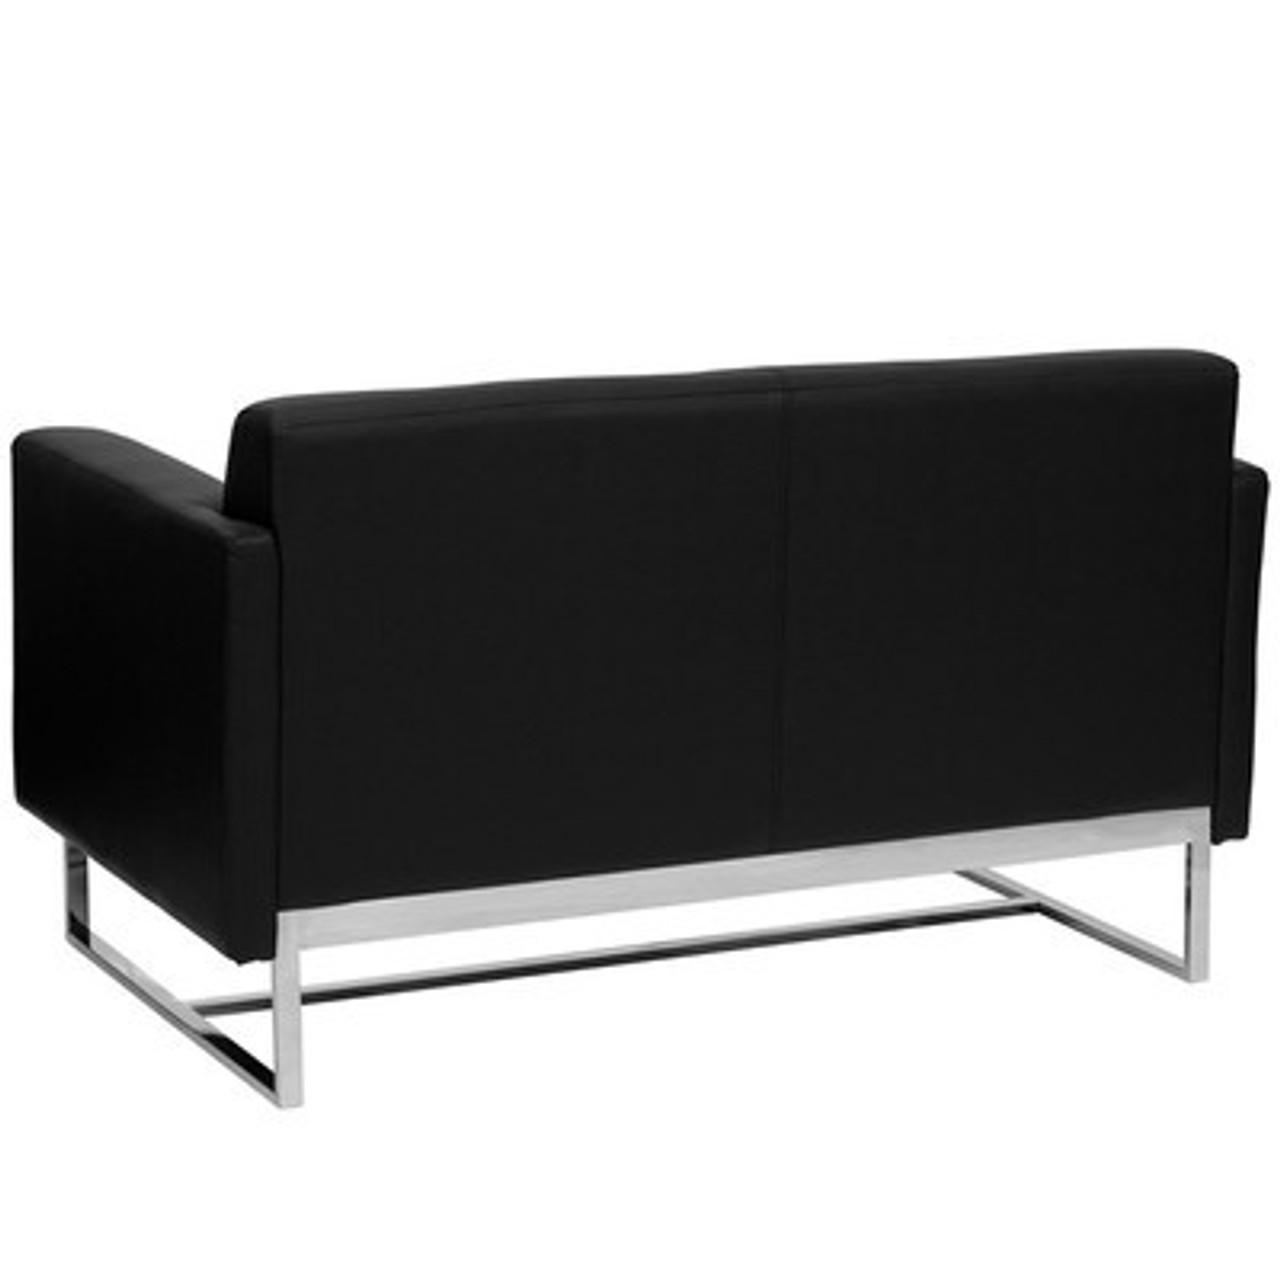 1pc Modern Leather Office Reception Loveseat, FF-0458-12